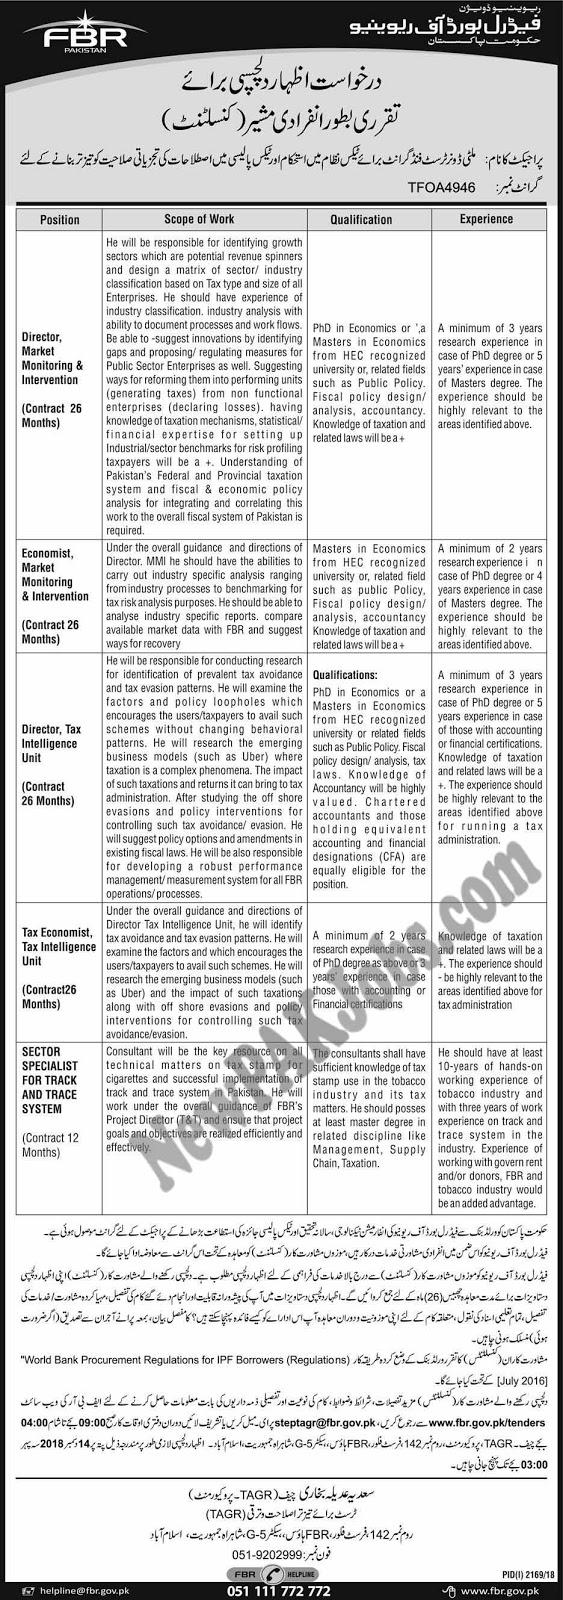 FBR jobs November 2018, Federal Board of Revenue Govt of Pakistan